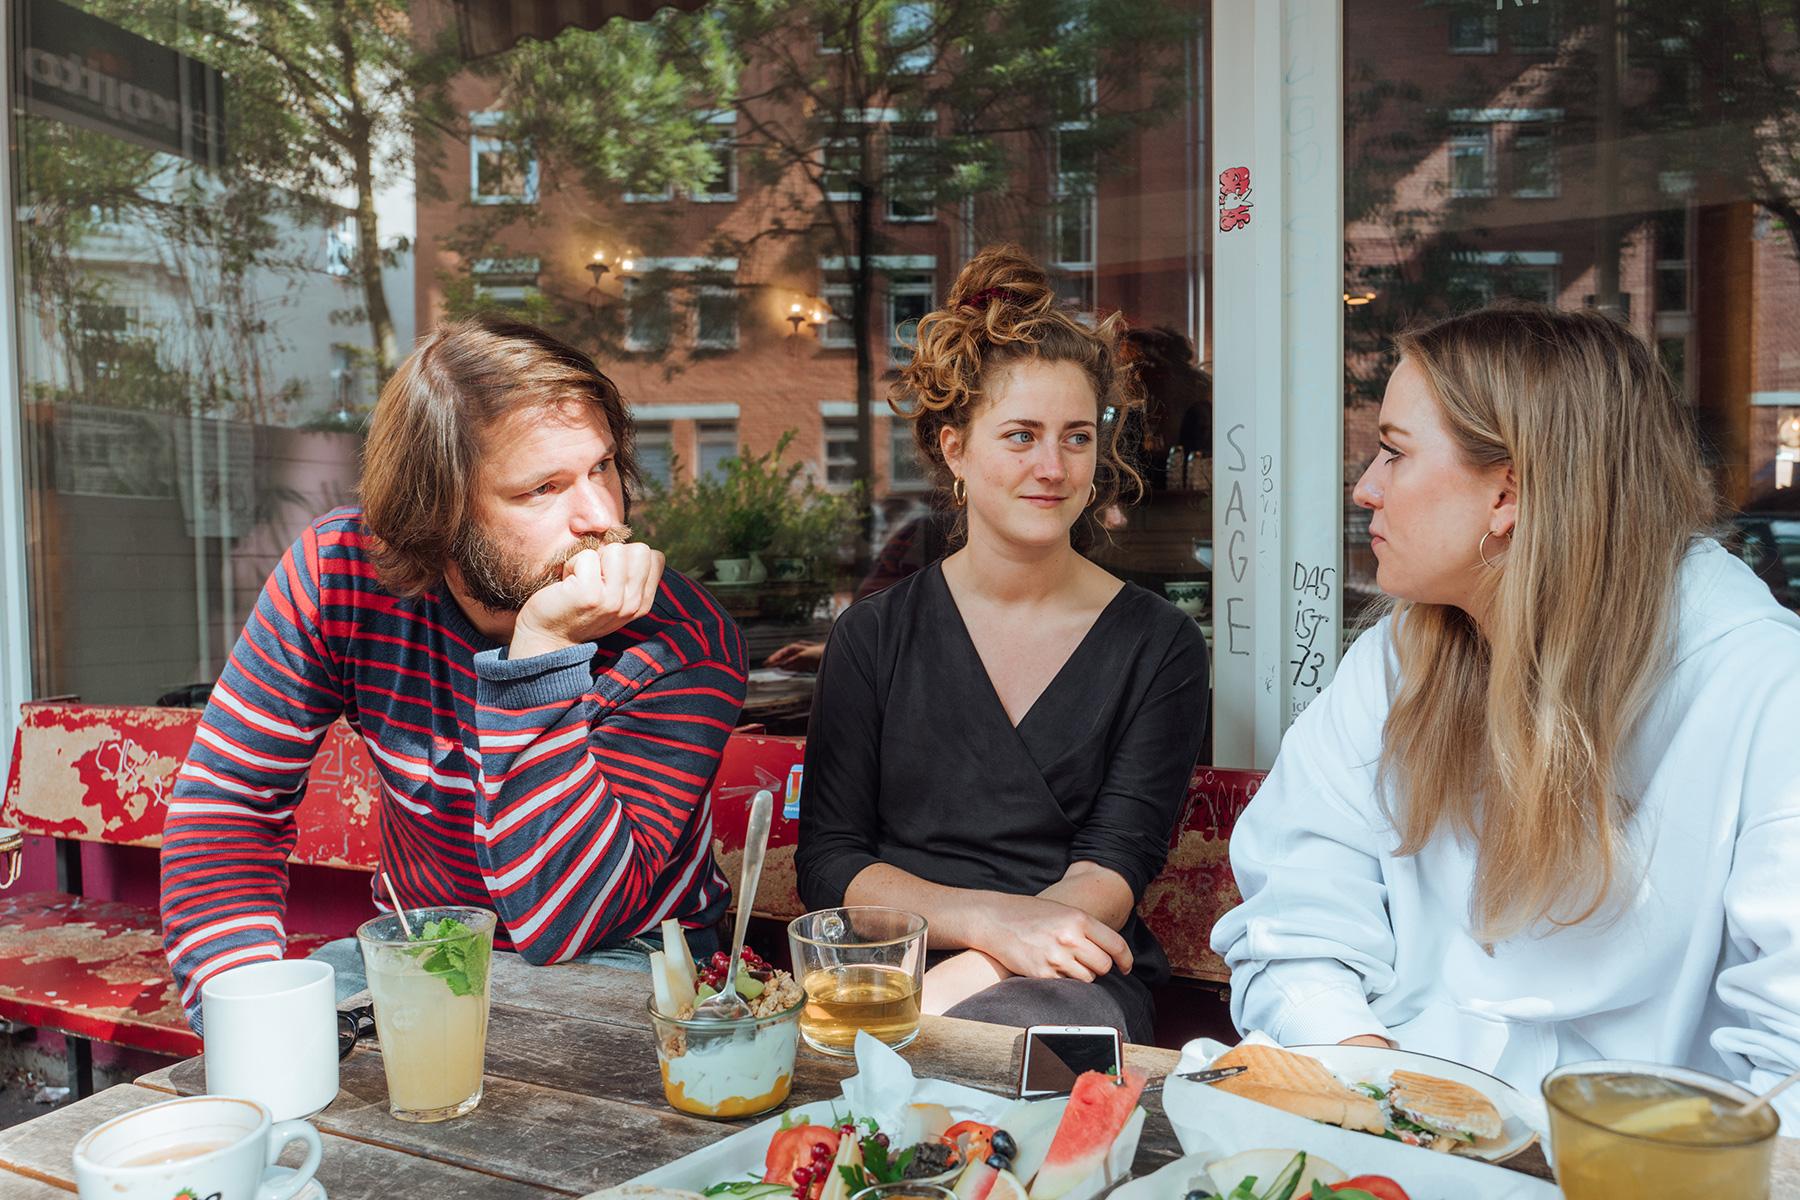 Kraweel StPauli cafe geheimtipp hamburg lisa knauer 14